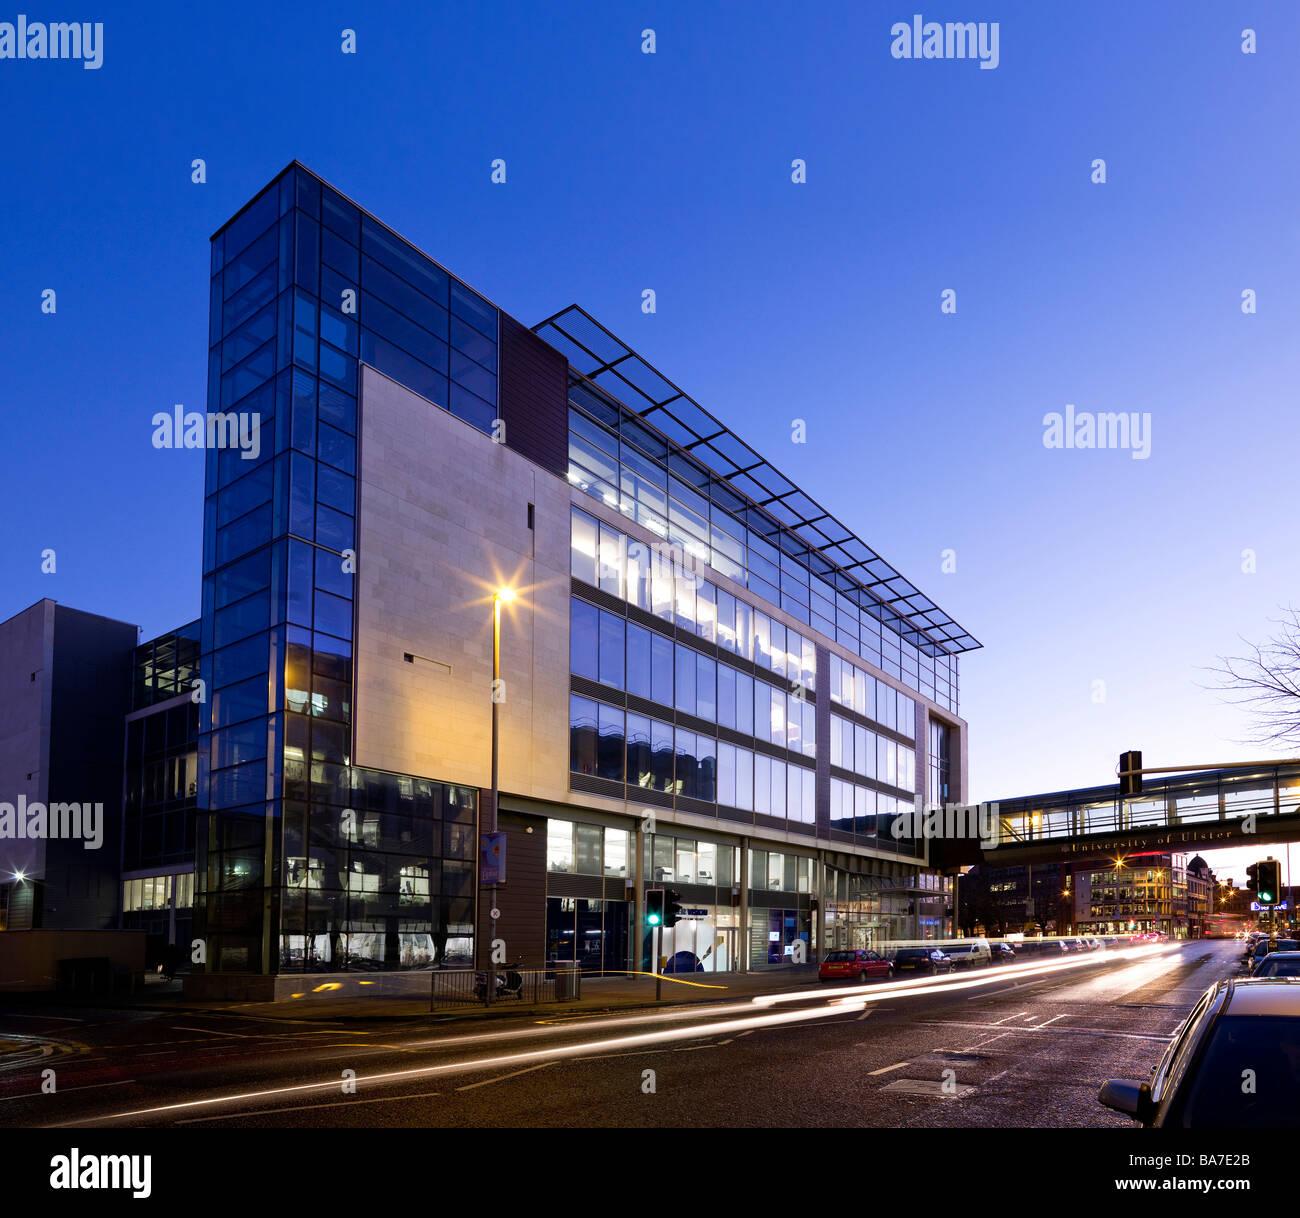 University of Ulster Belfast Northern Ireland - Stock Image